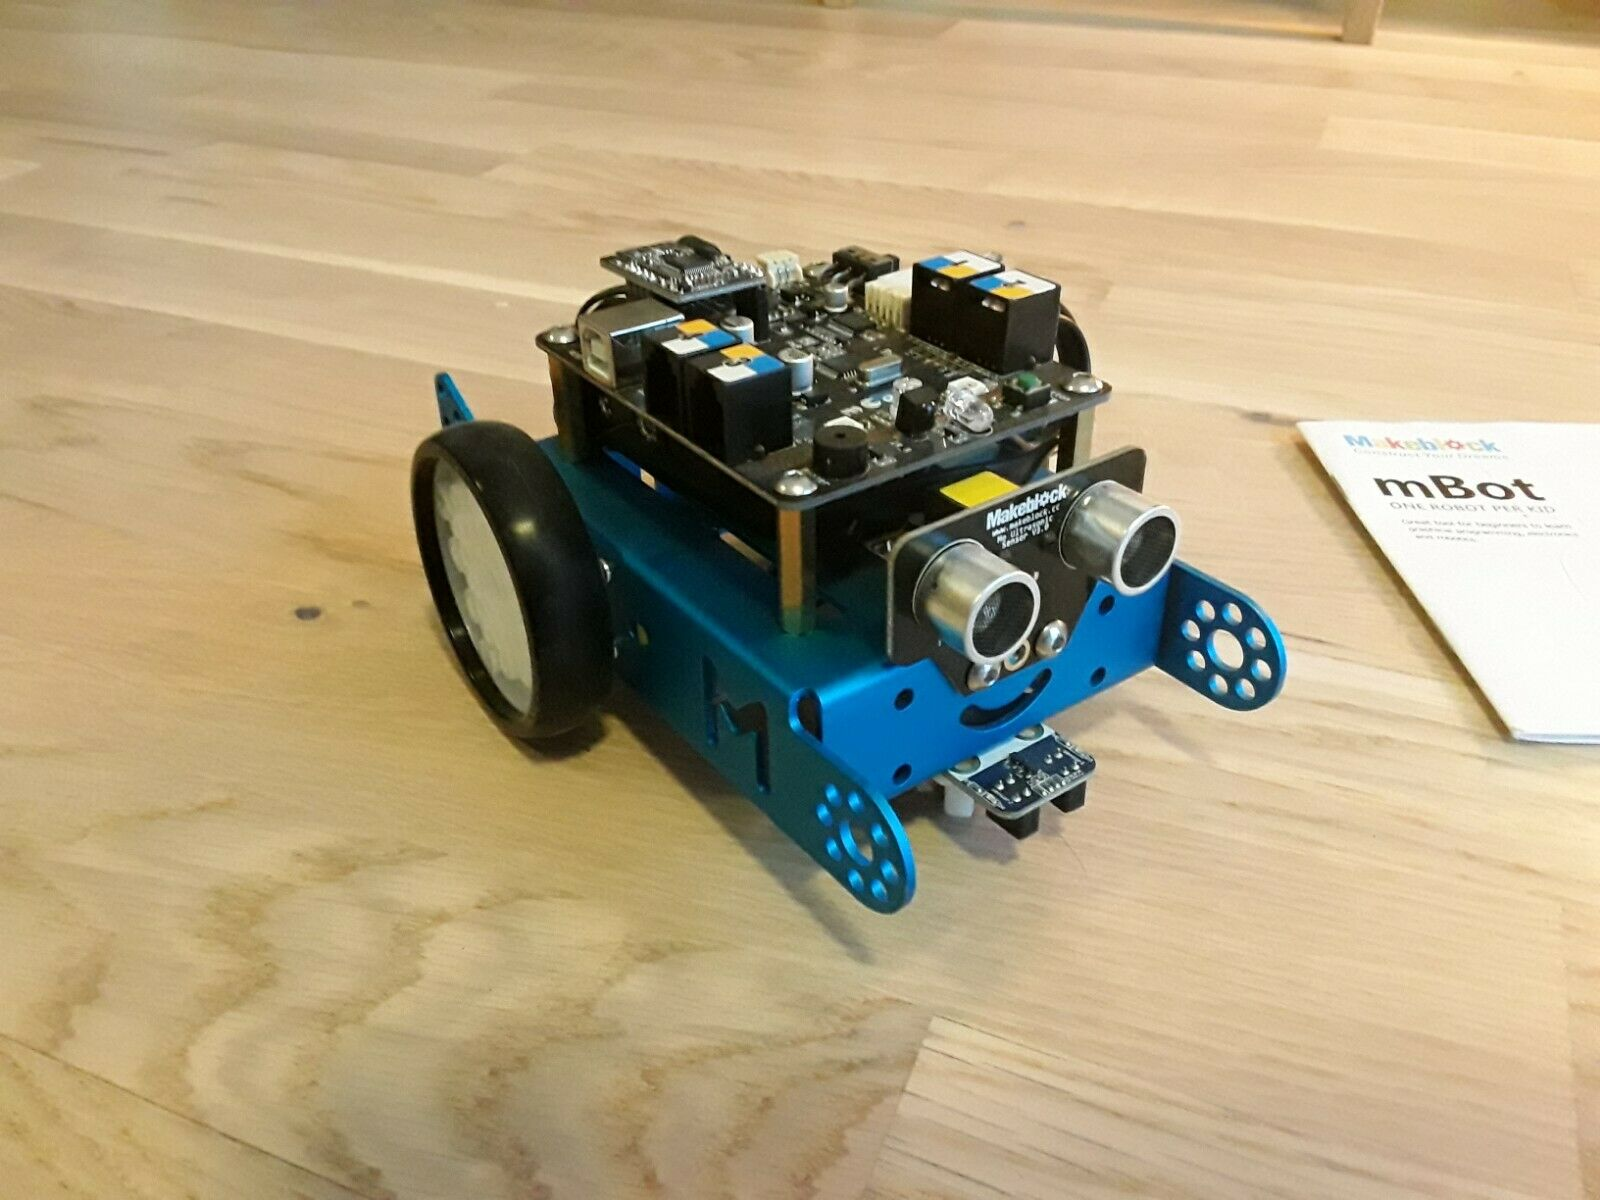 Makeblock Mbot Kit EDUCATIVO Robot